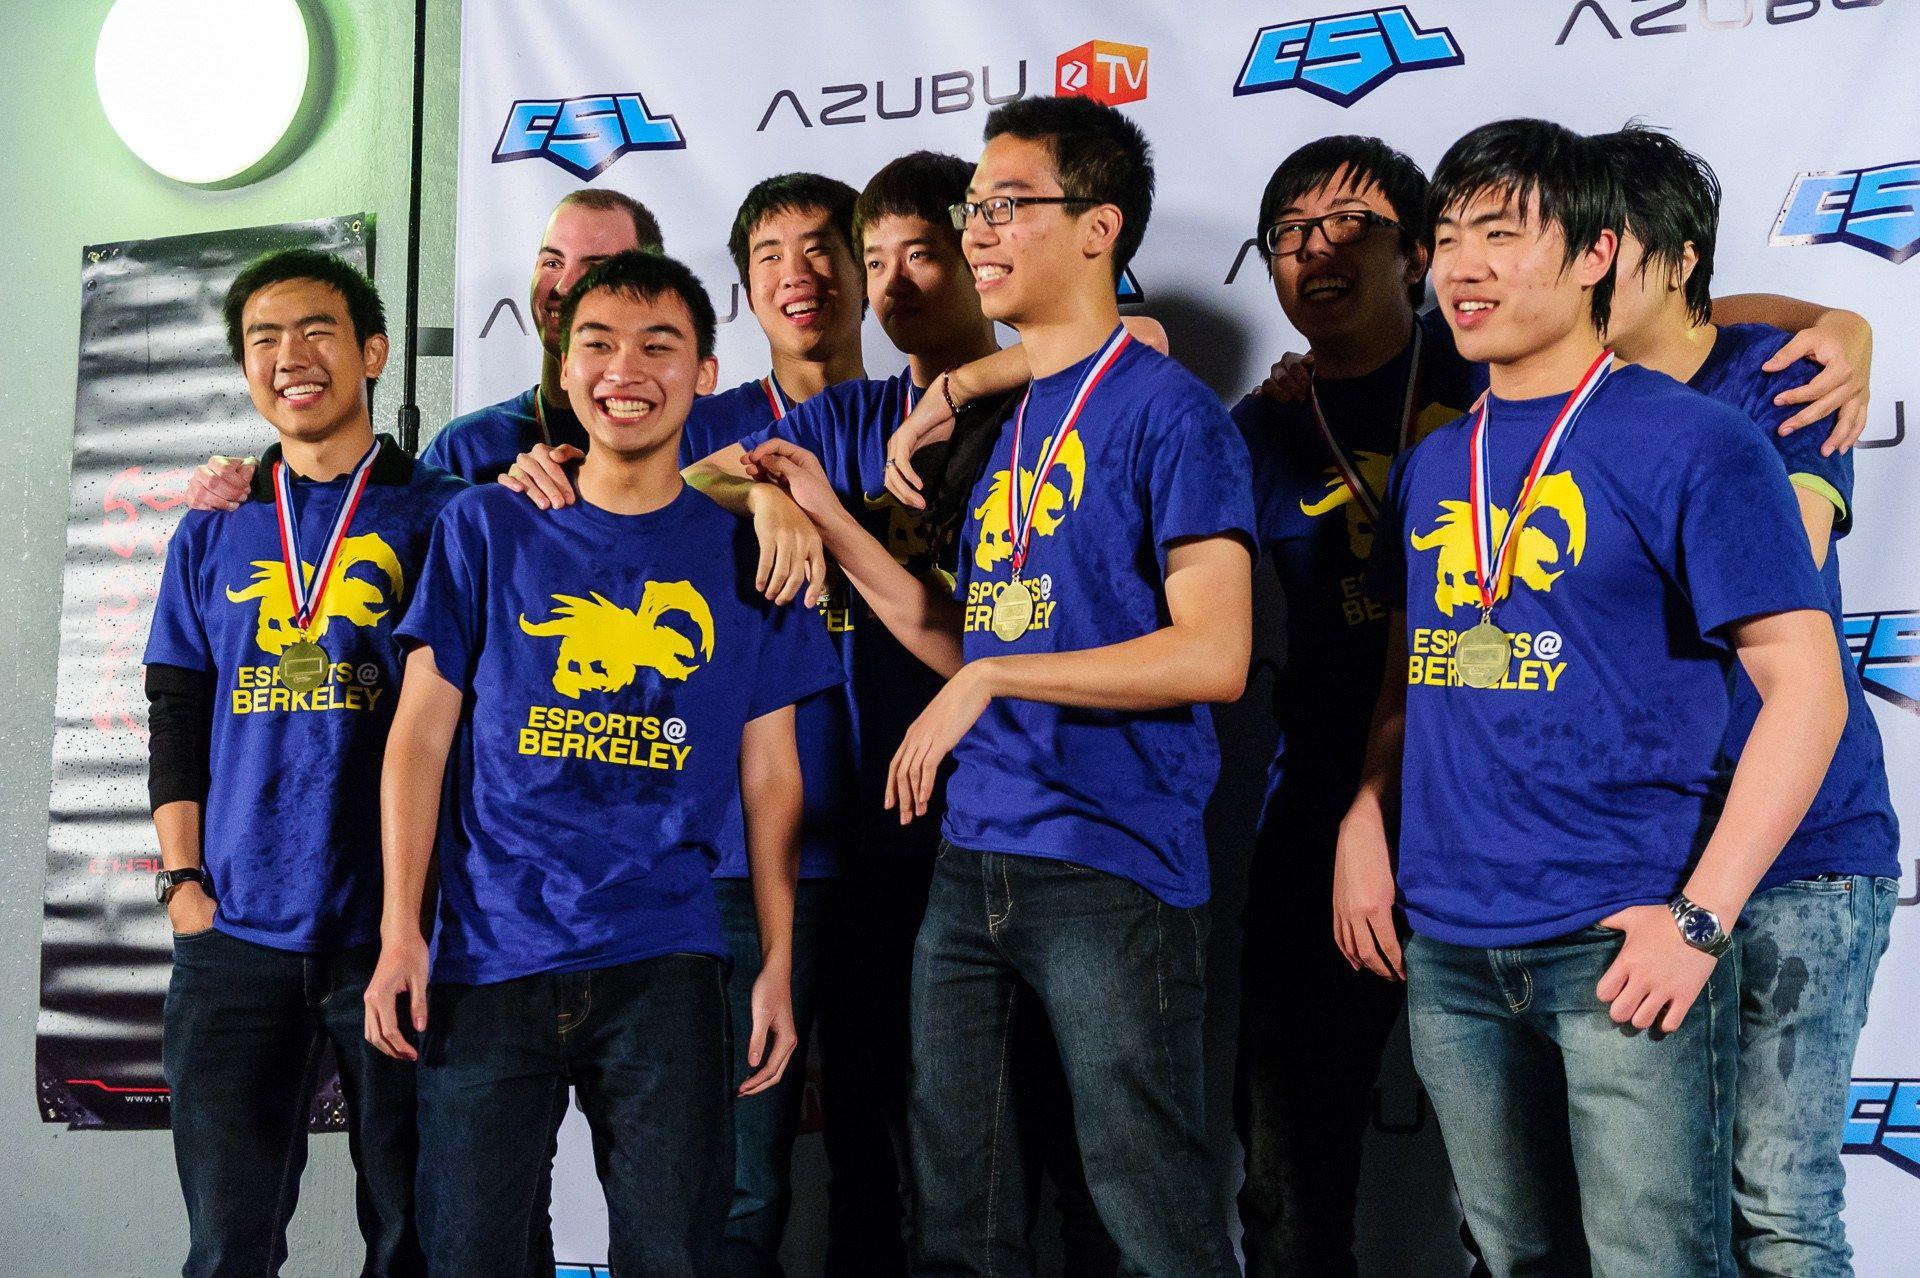 UC Berkeley video game tournament Video game tournaments